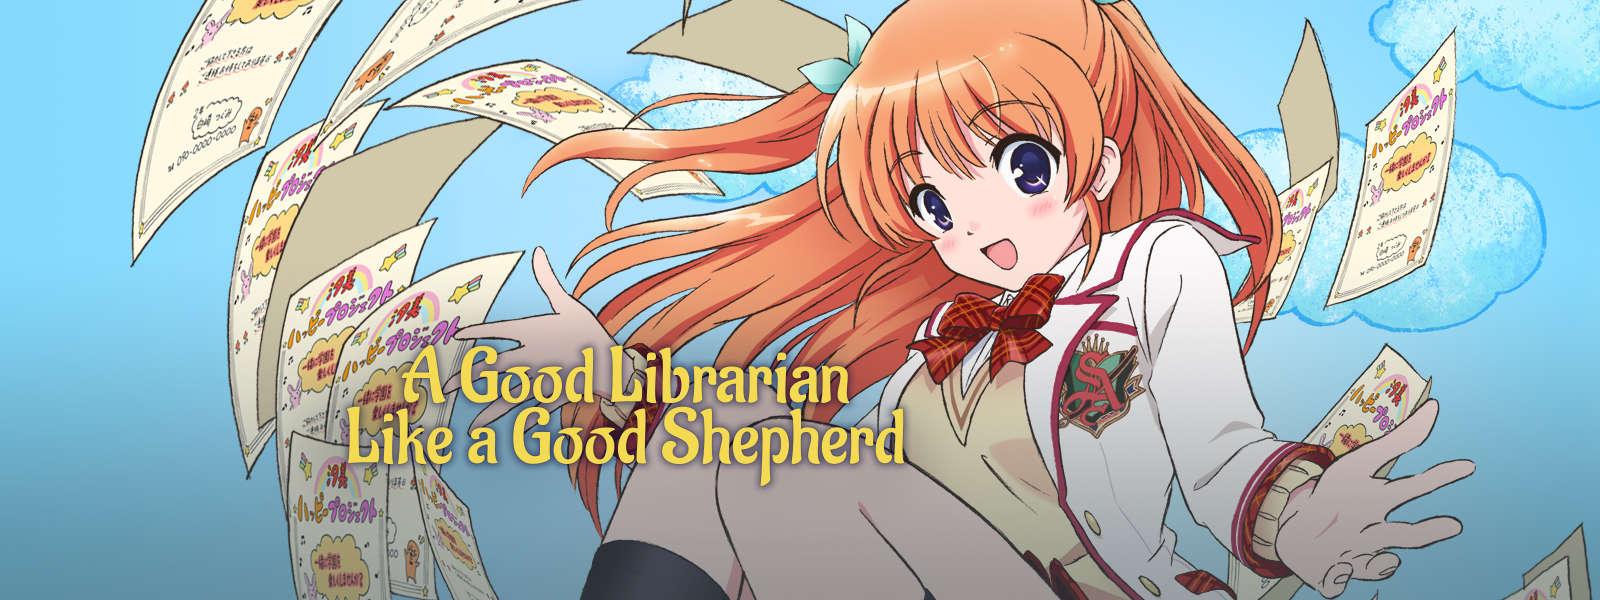 A good librarian like a good shepherd